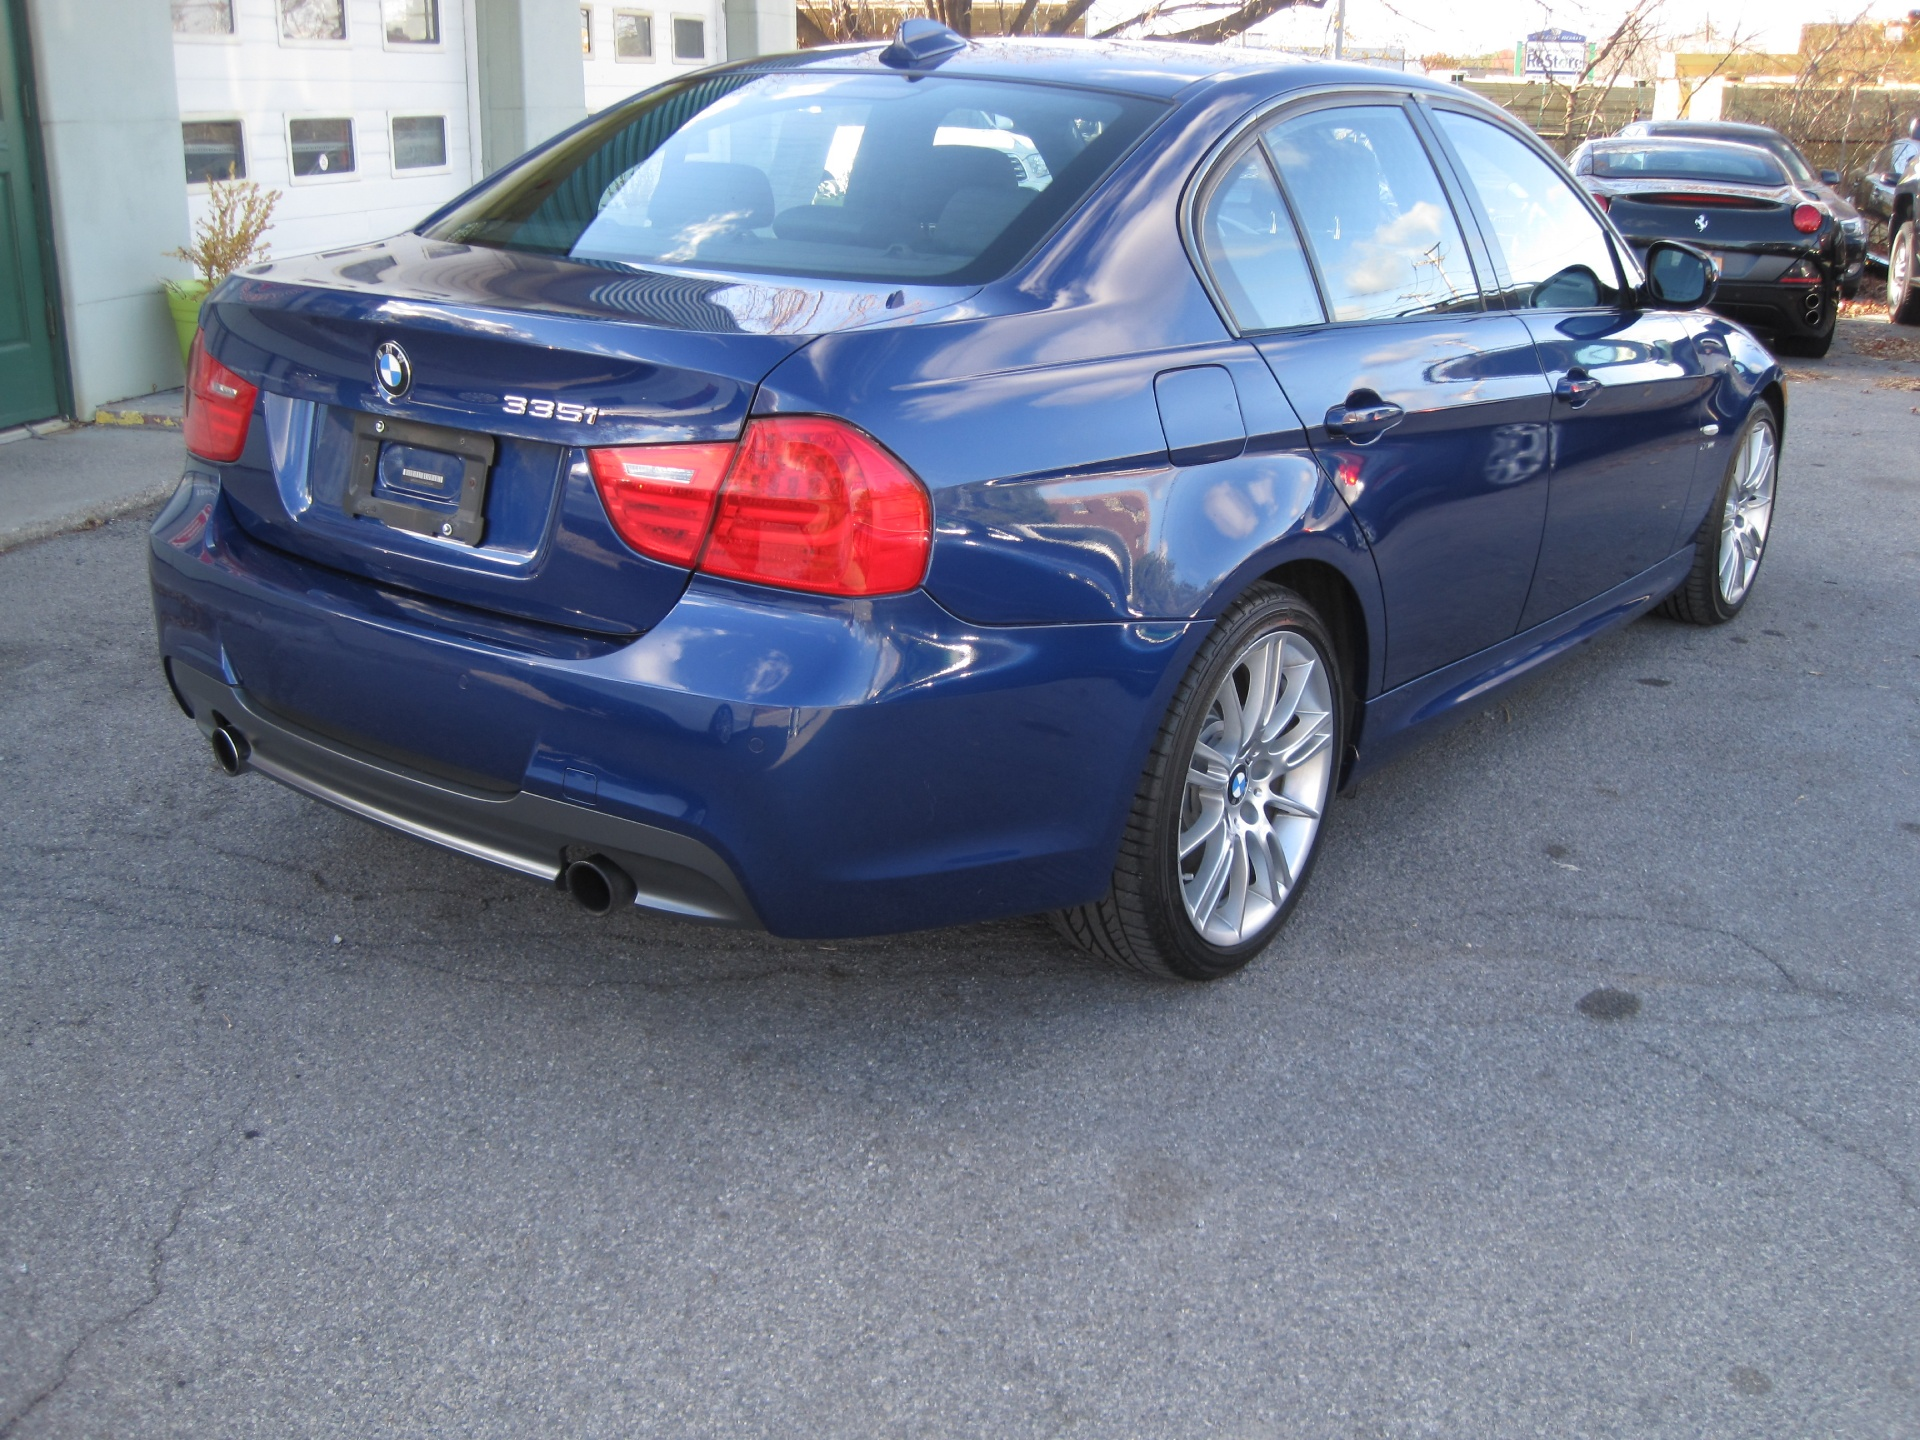 BMW Series I XDrive SUPER RARE SPEED MANUALM SPORT - 2010 bmw 335i m sport